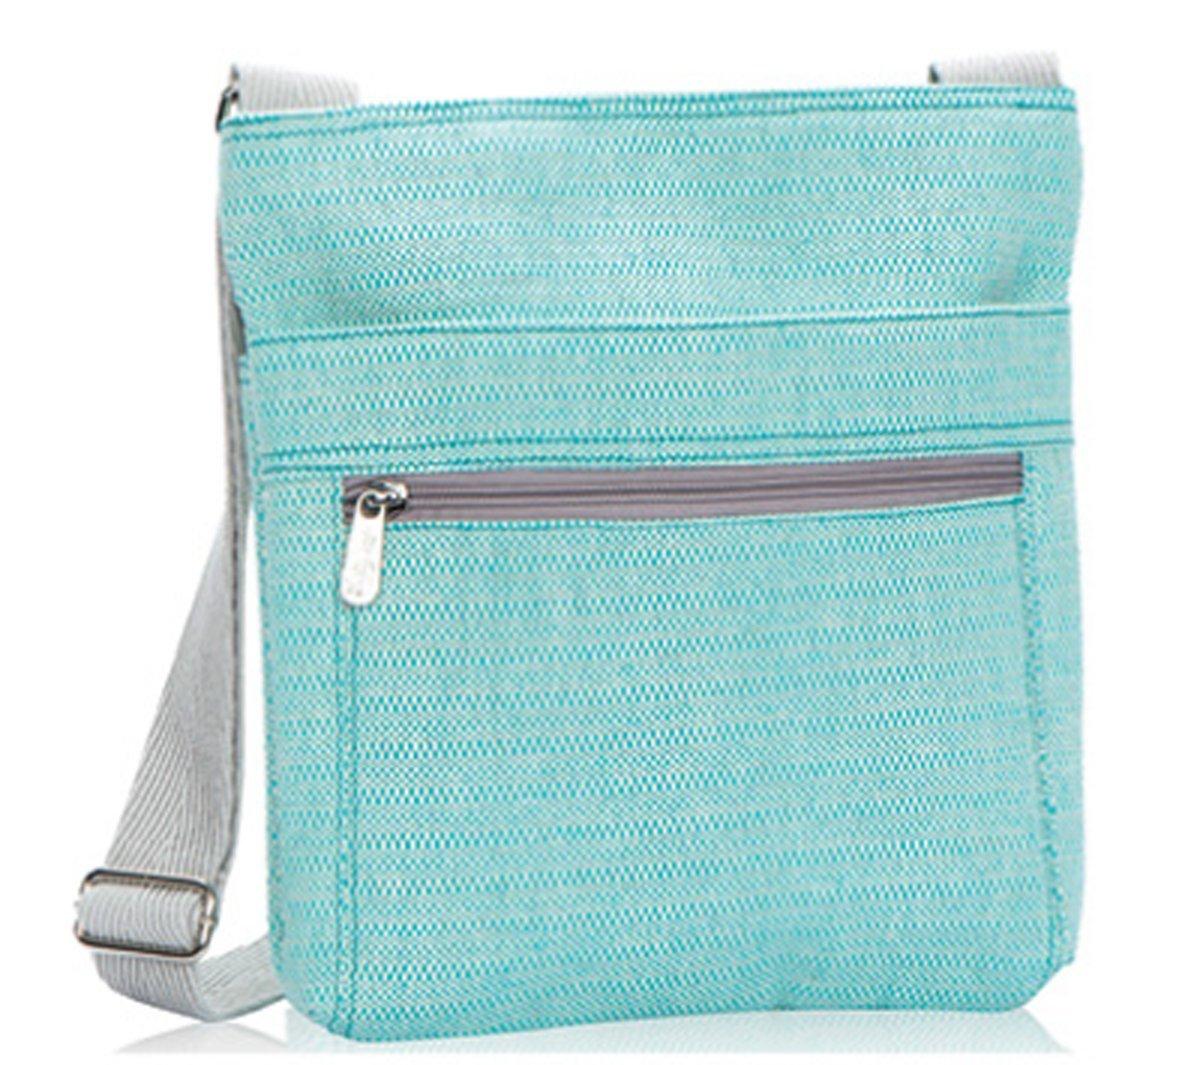 Thirty One Organizing Shoulder Bag Dimensions 94